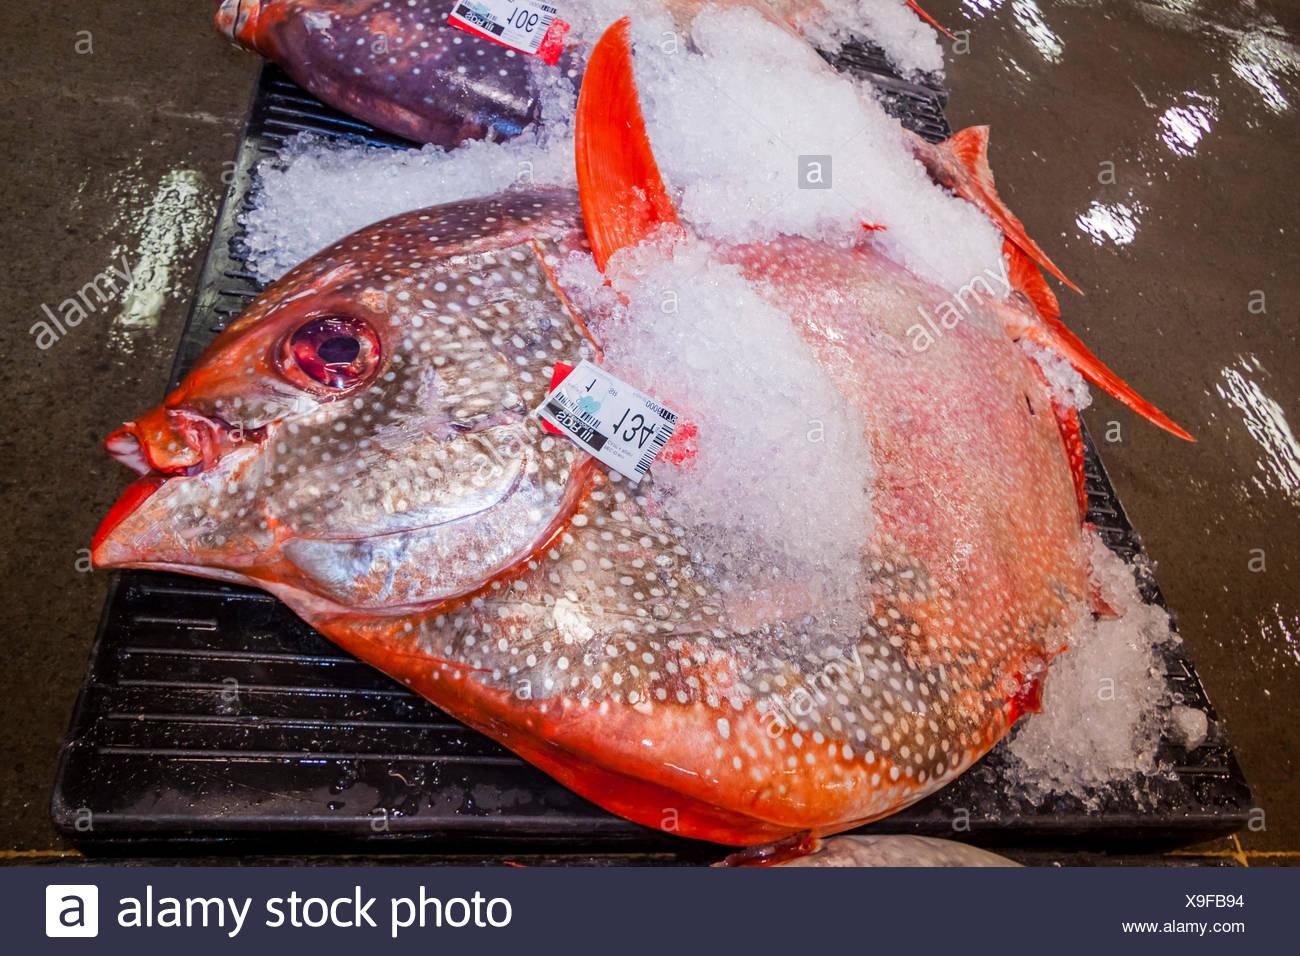 Moonfish all'asta del pesce, Lampris guttatus, Hawaii, STATI UNITI D'AMERICA Foto Stock